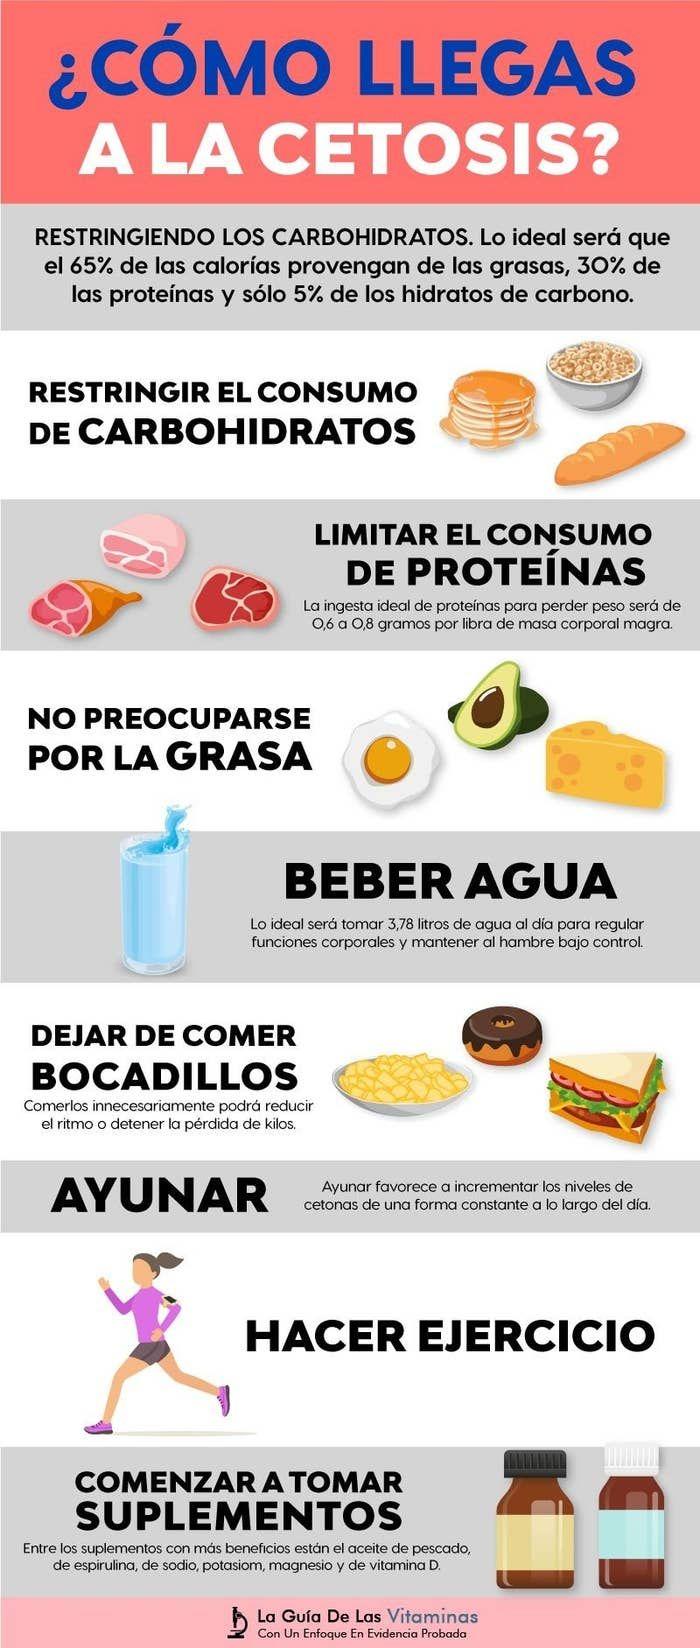 38 Ideas De Diet Dieta Cetogenica Alimentos Dieta Cetogenica Menu Dieta Cetogenica